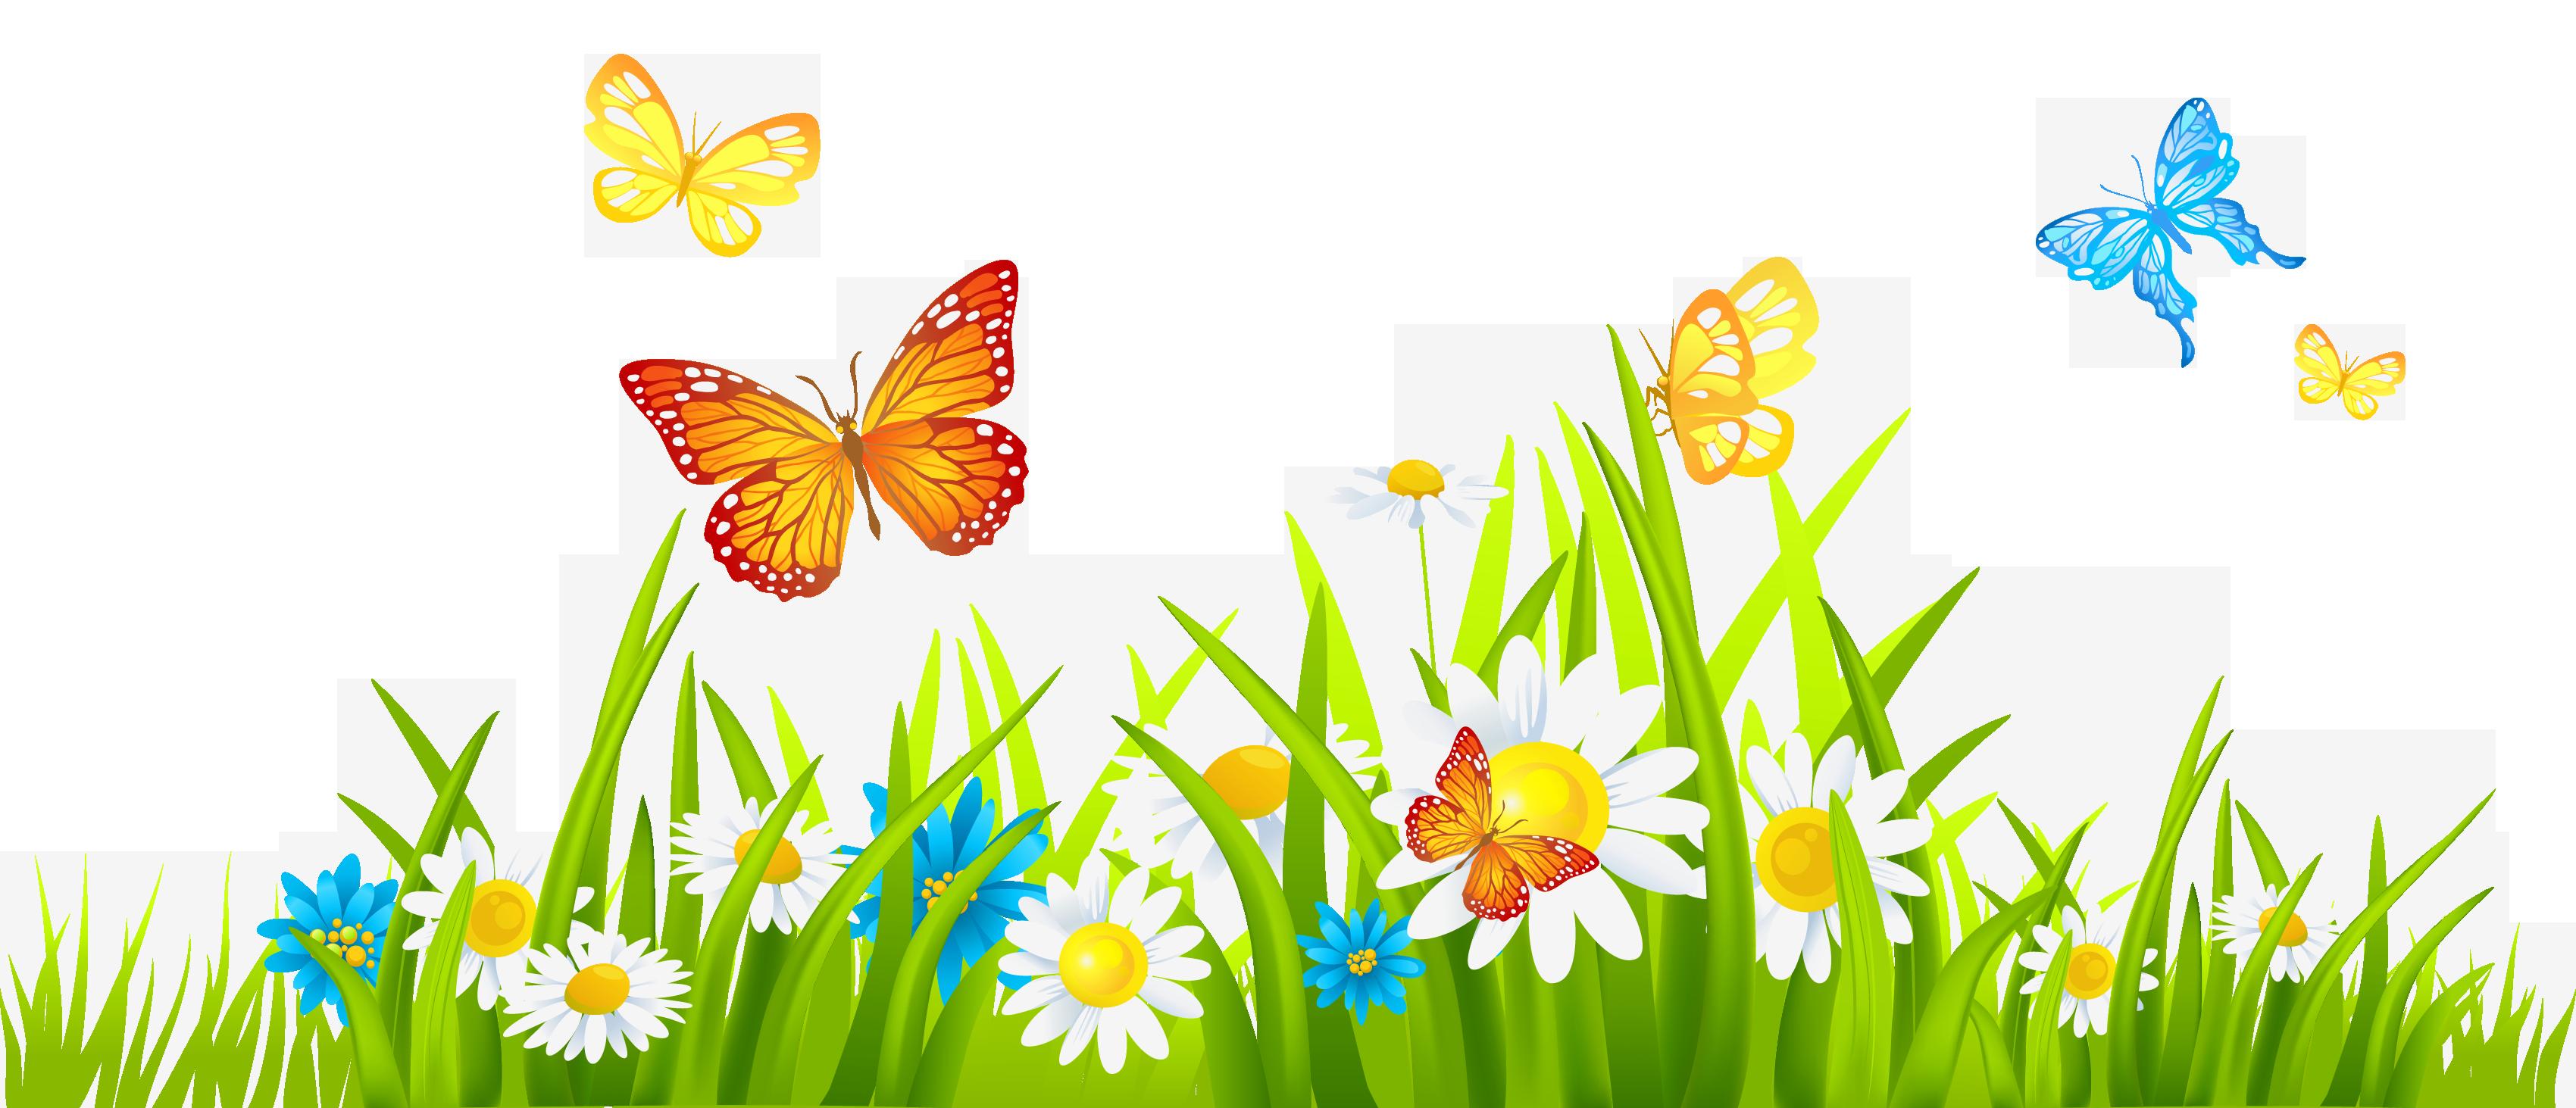 Garden Clip Art Images